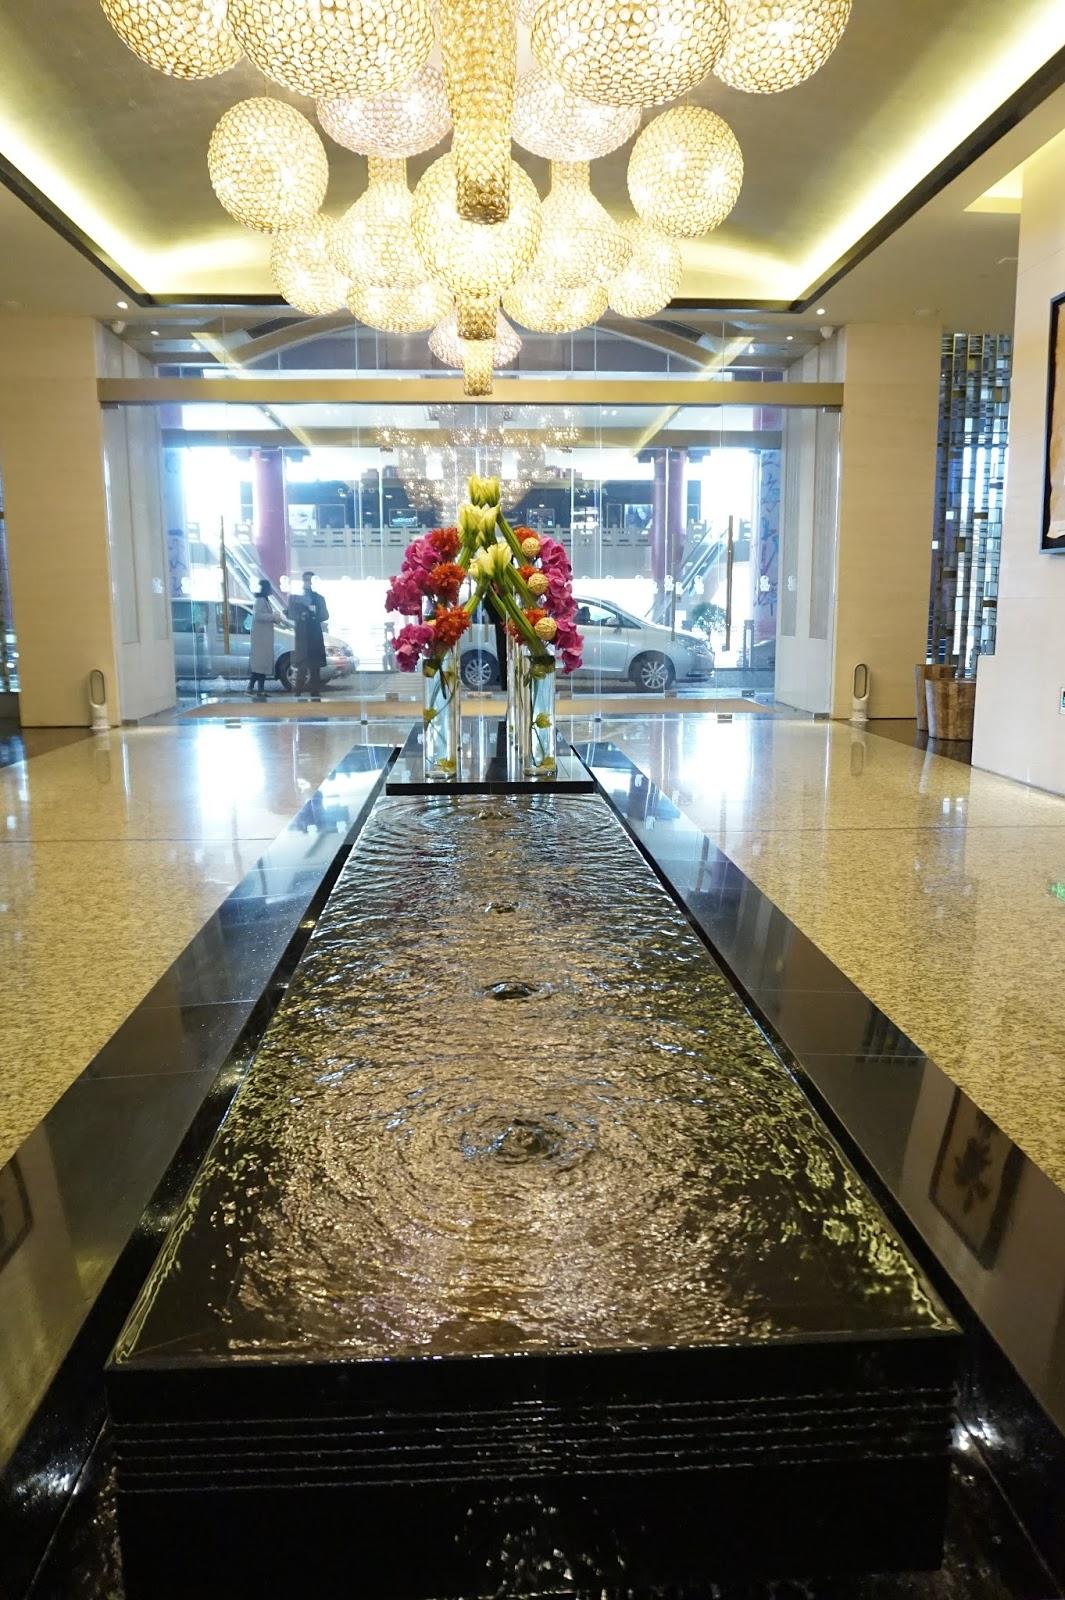 portman ritz-carlton shanghai china prc hotel lobby review